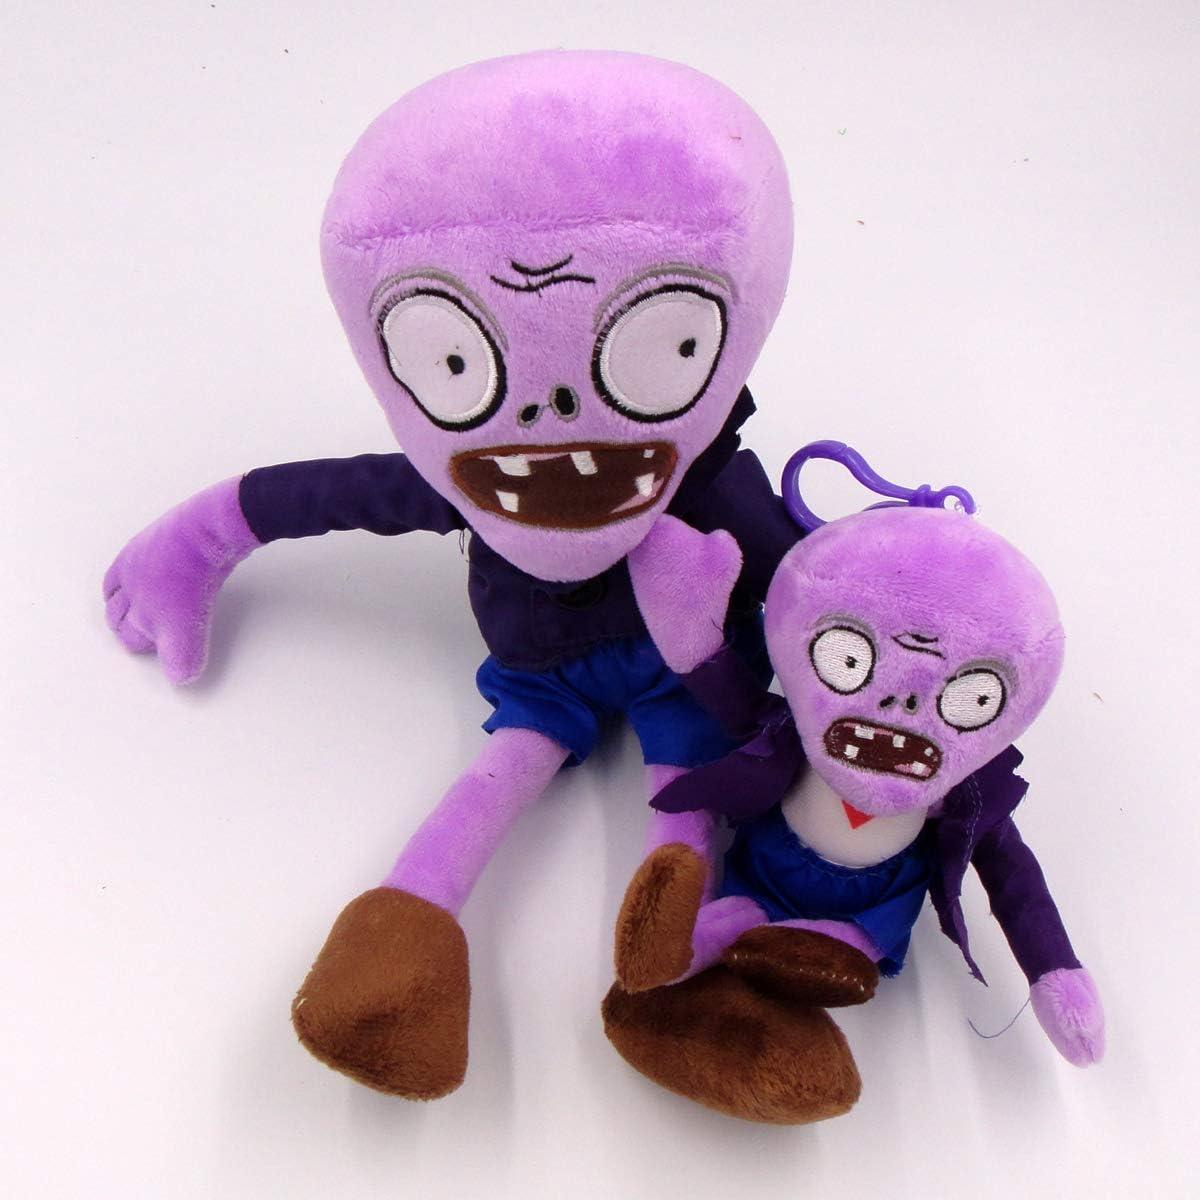 TavasHome Plants VS Zombies 2 PVZ Figures Plush Toys Set,Stuffed Soft Game Doll - Purple Zombie and A Baby Zombie